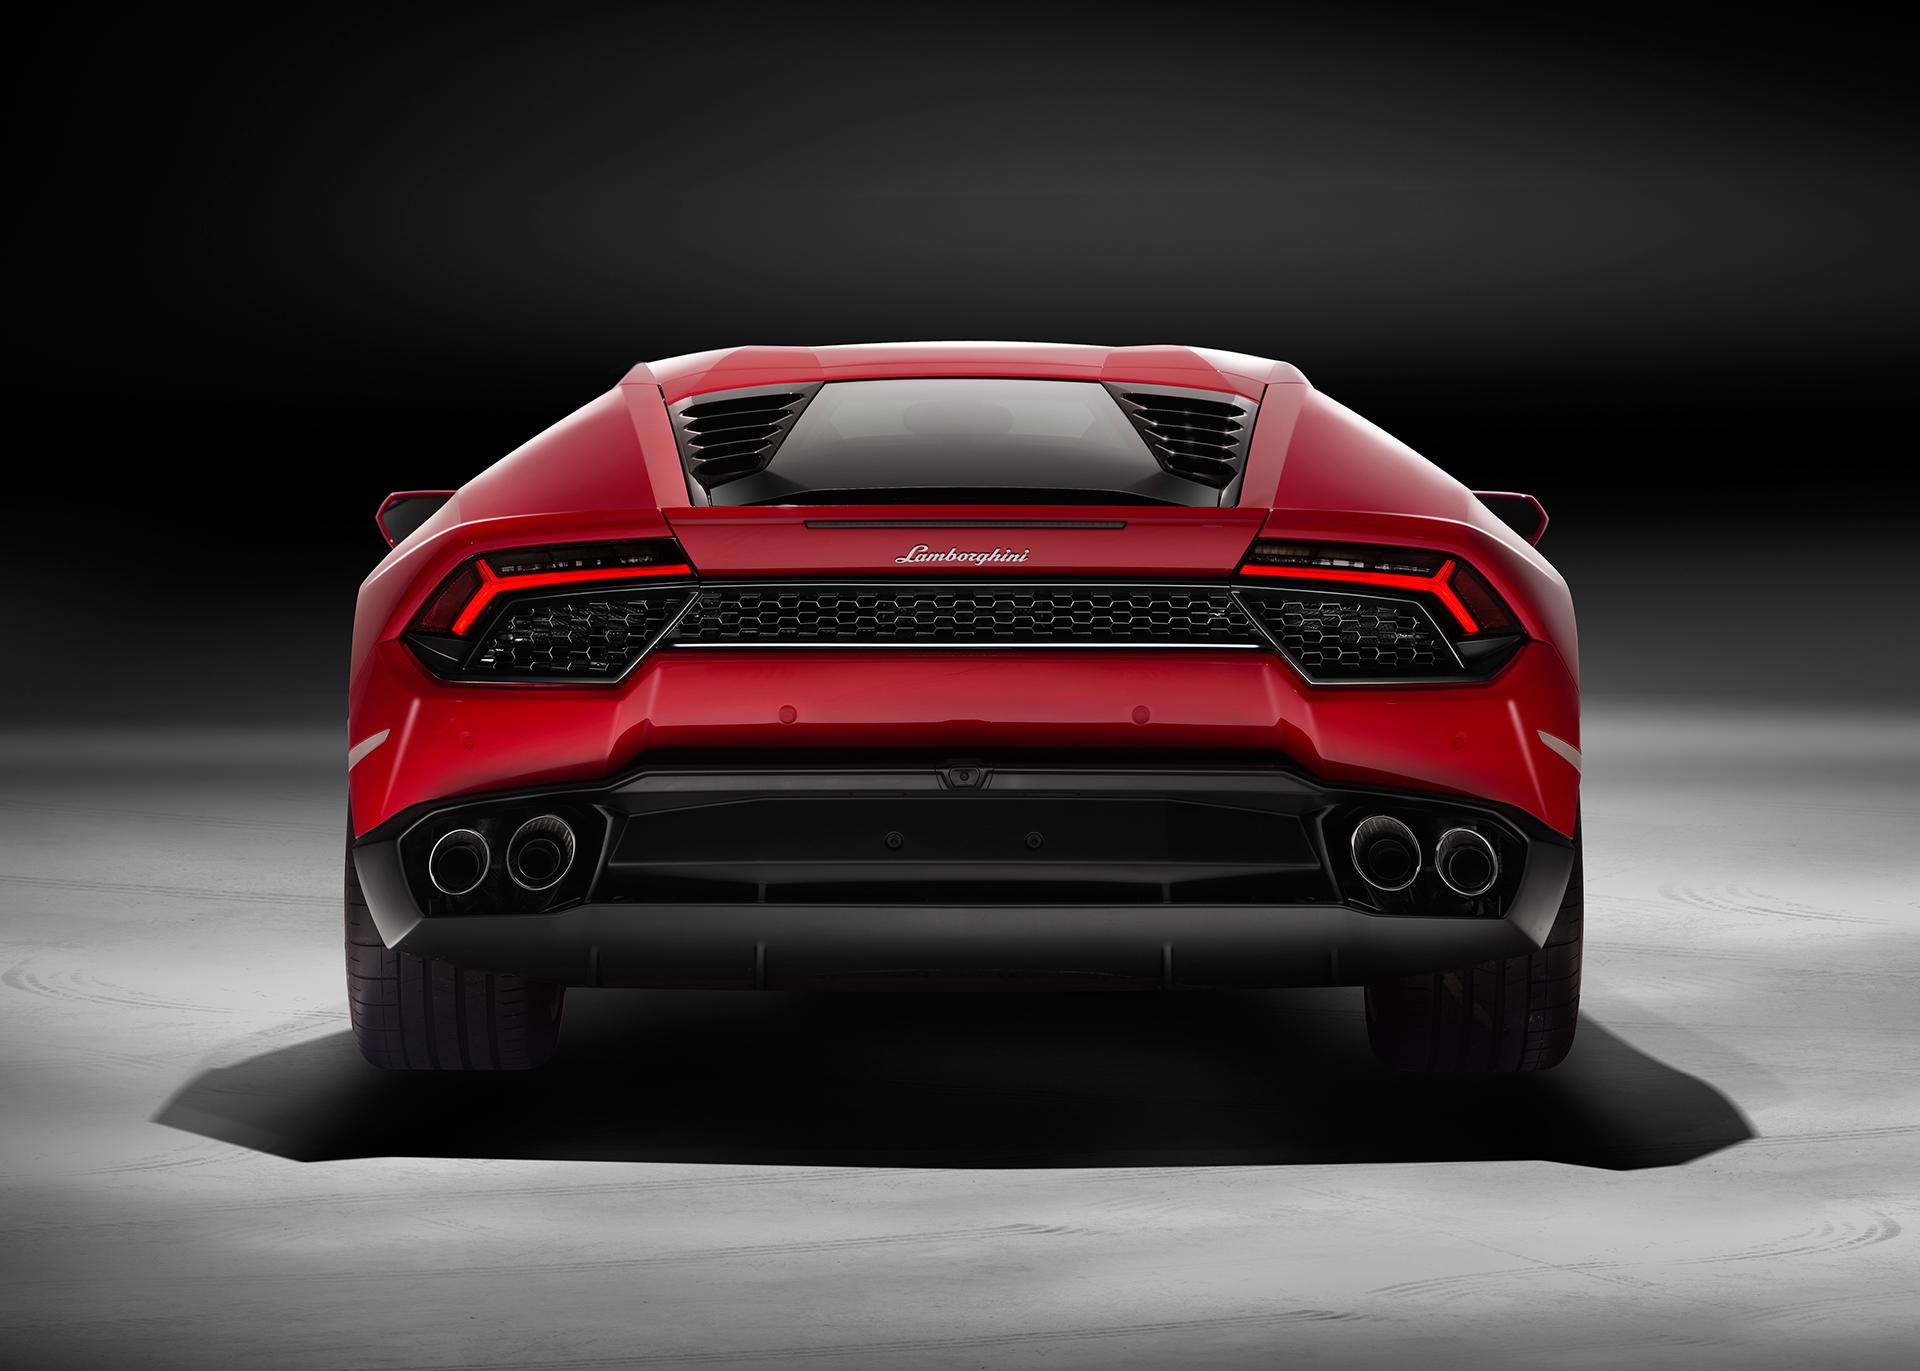 Lamborghini Huracán LP 580-2 - arrière / rear